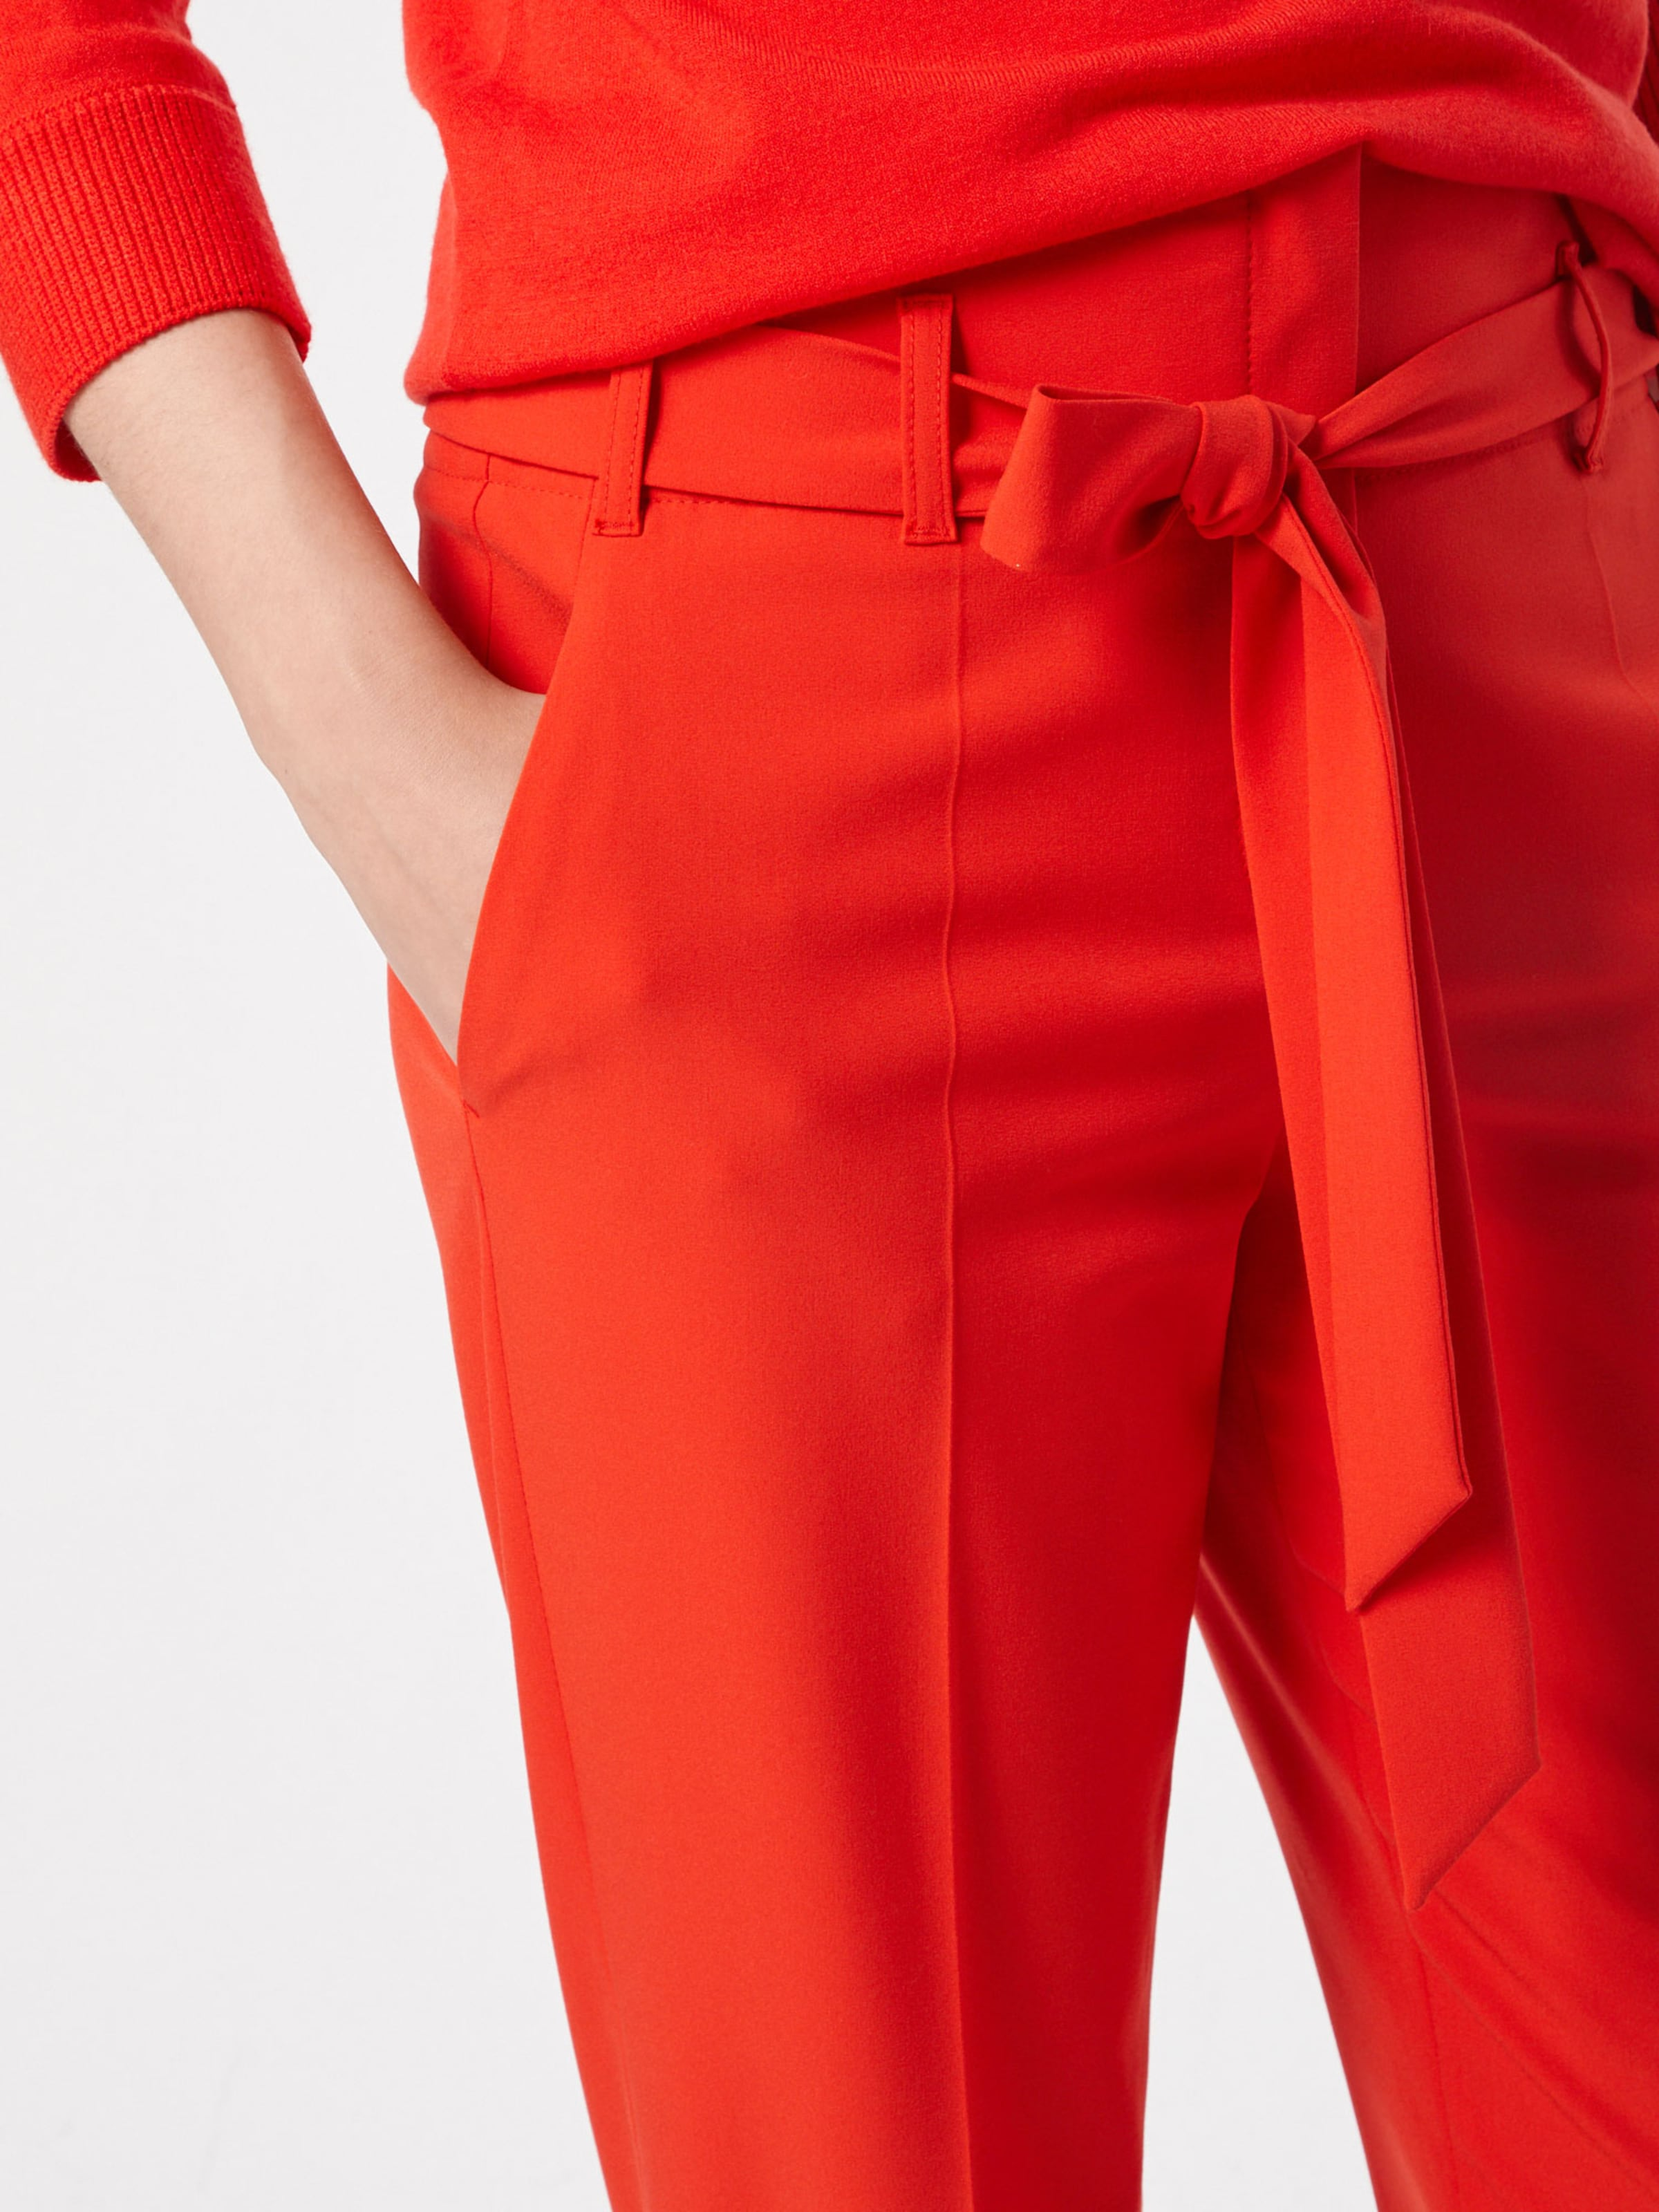 Rouge Plis À '82018' Pantalon Laurel En mwN0Onv8